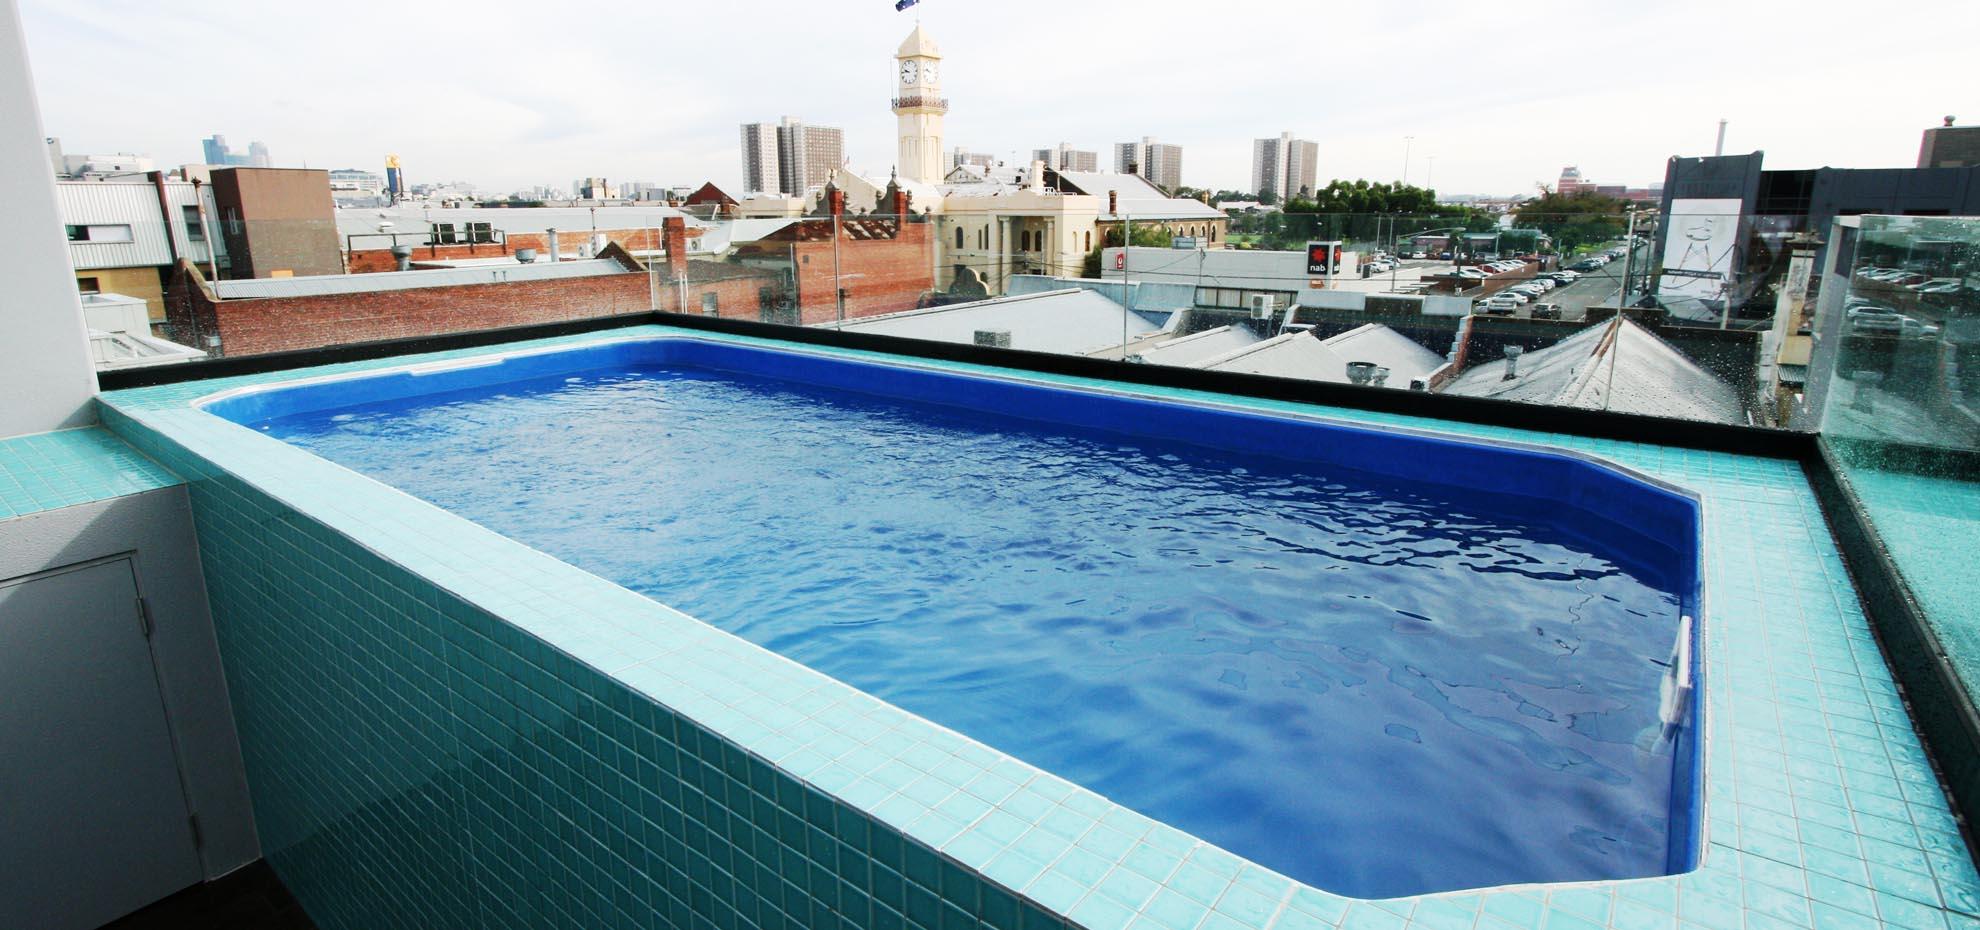 Leisure pools la piscine coque olympus un mod le convivial et confortable - Piscine leisure pools ...